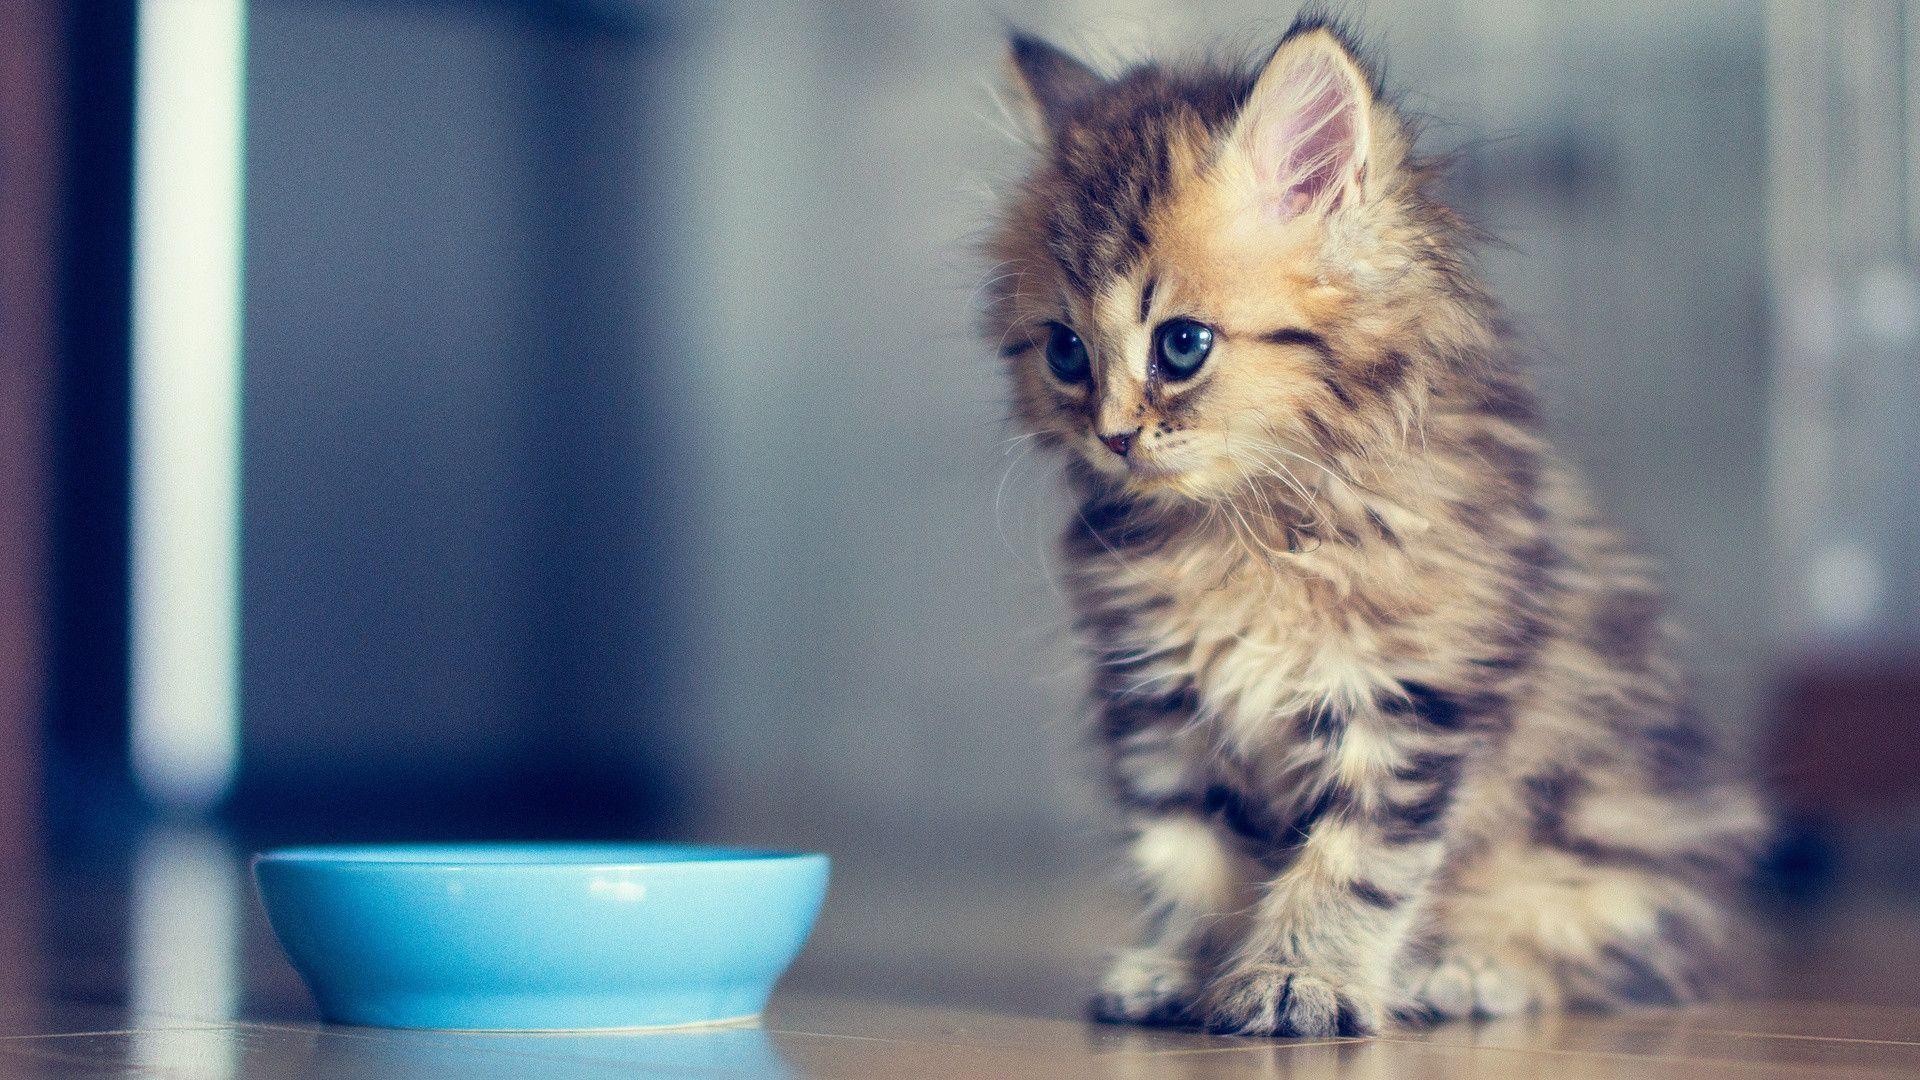 Funny Kitten Wallpapers Wallpaper